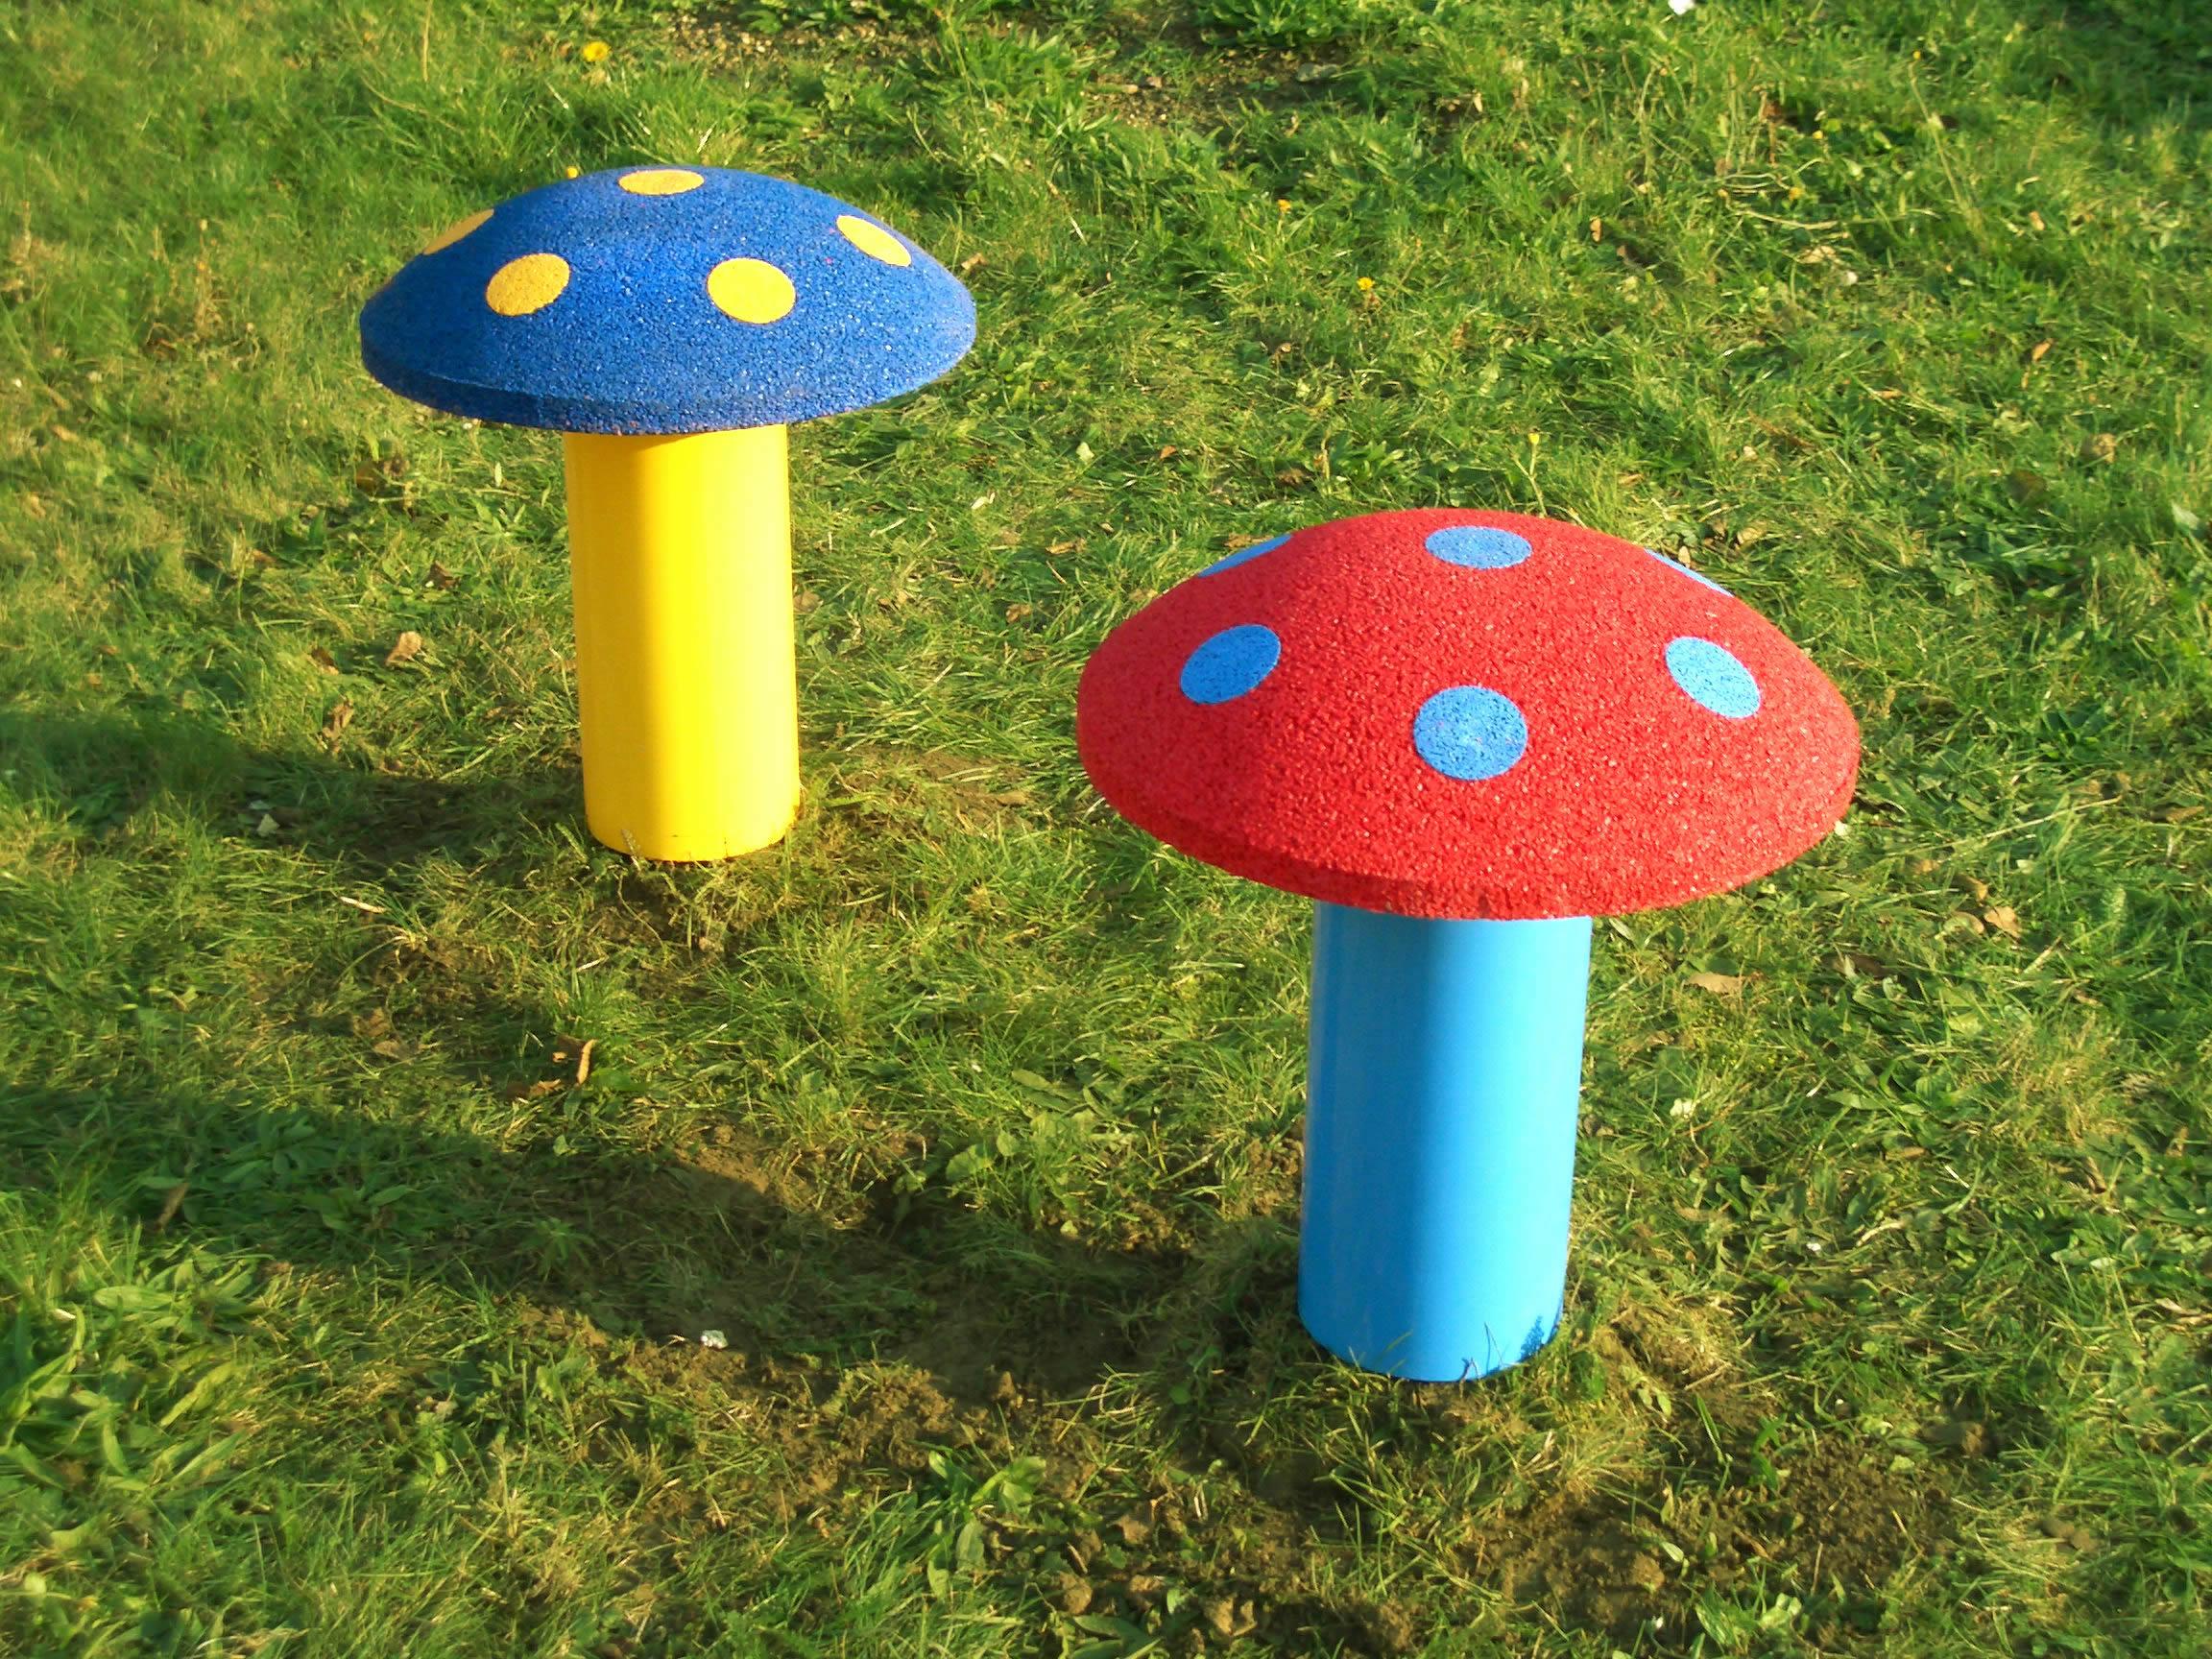 mushroom-seats-furniture-playgrounds-2